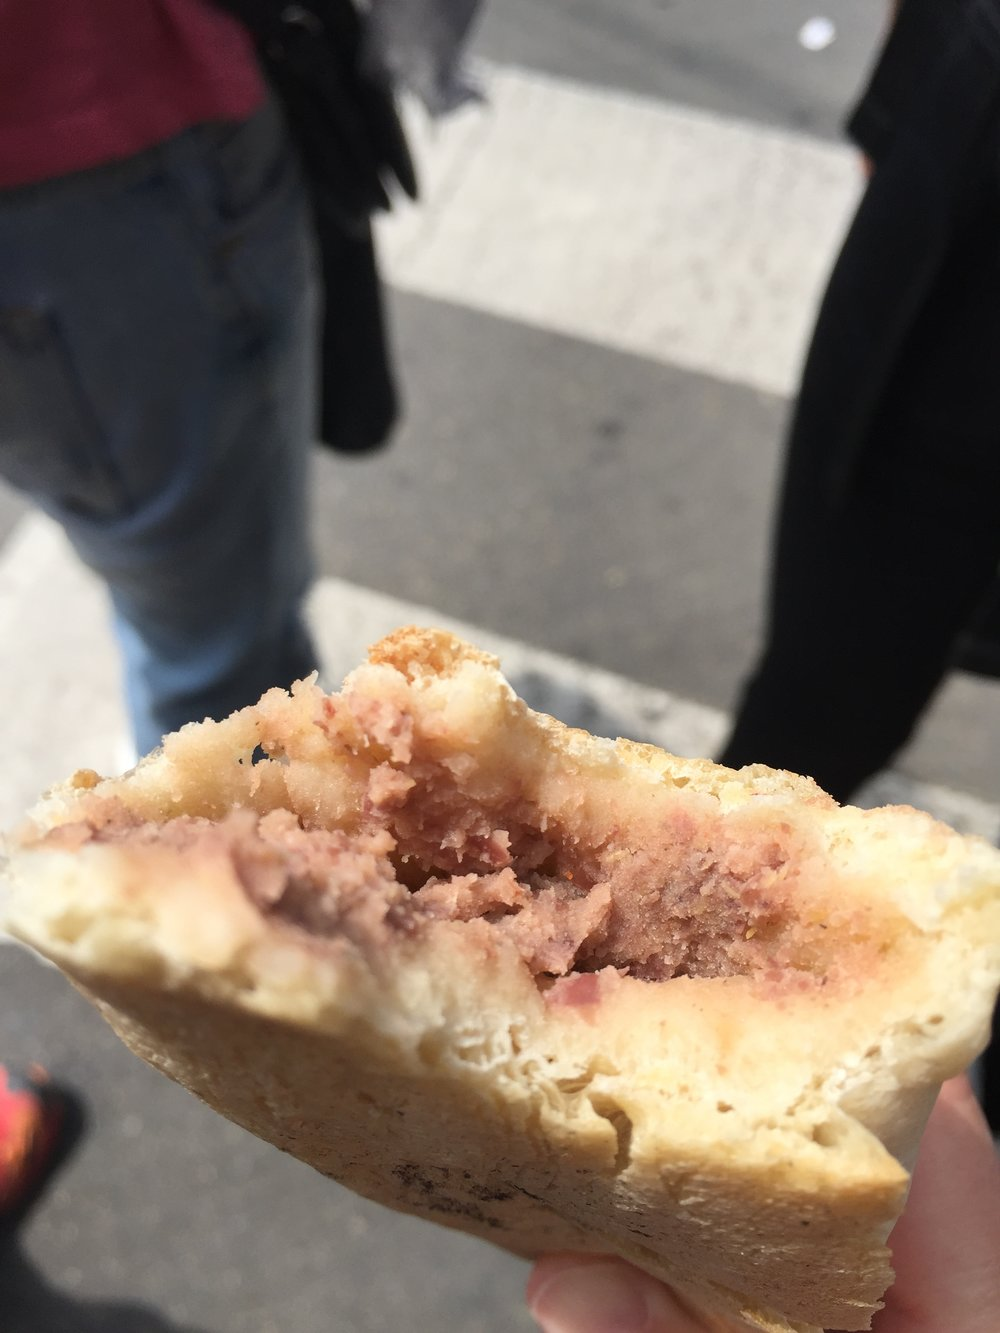 Unique Georgian Foods to Try - lobiani